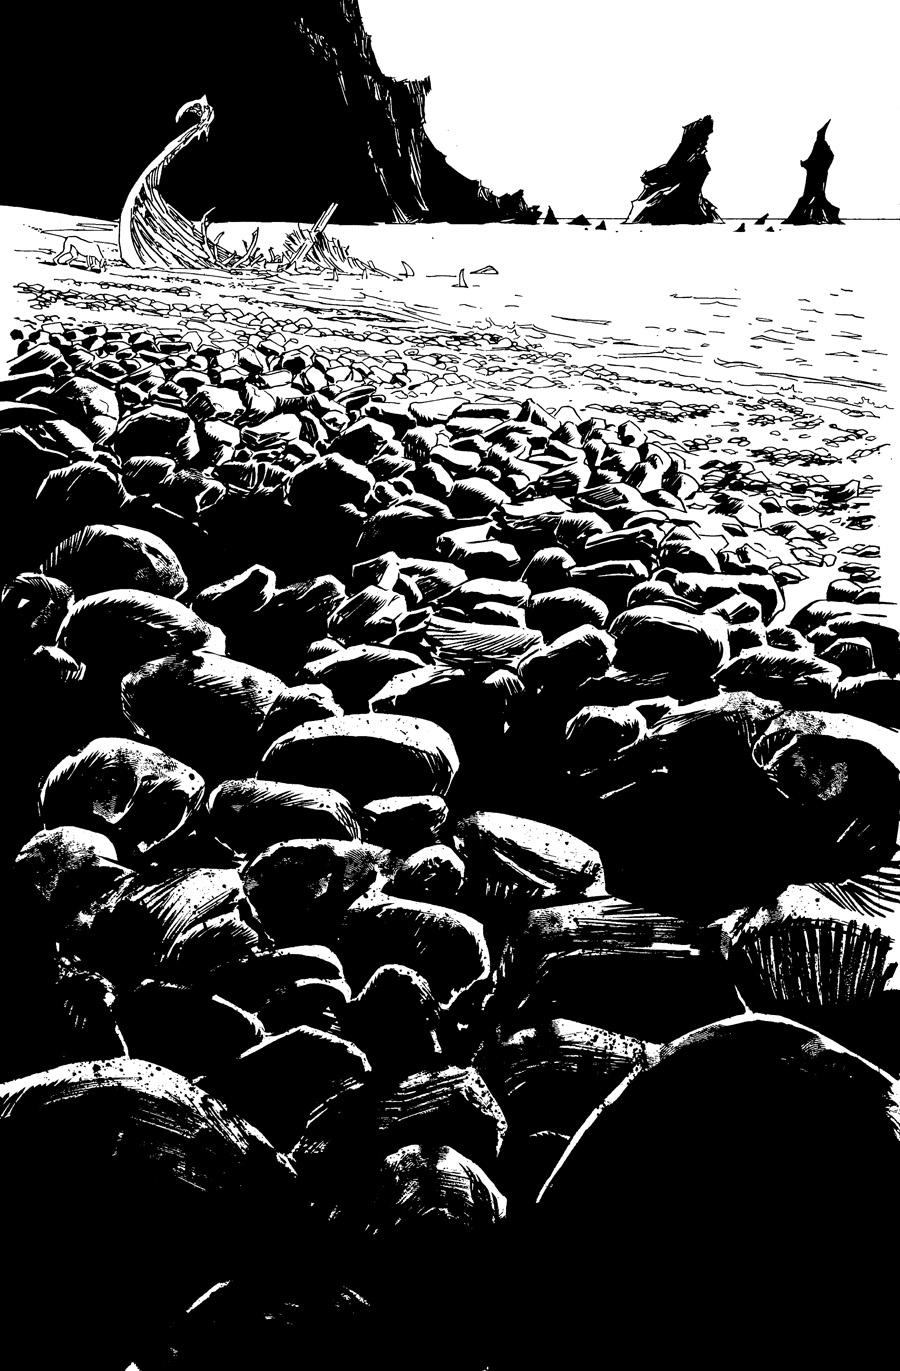 NORTHLANDERS 45 Page 1 by DeclanShalvey